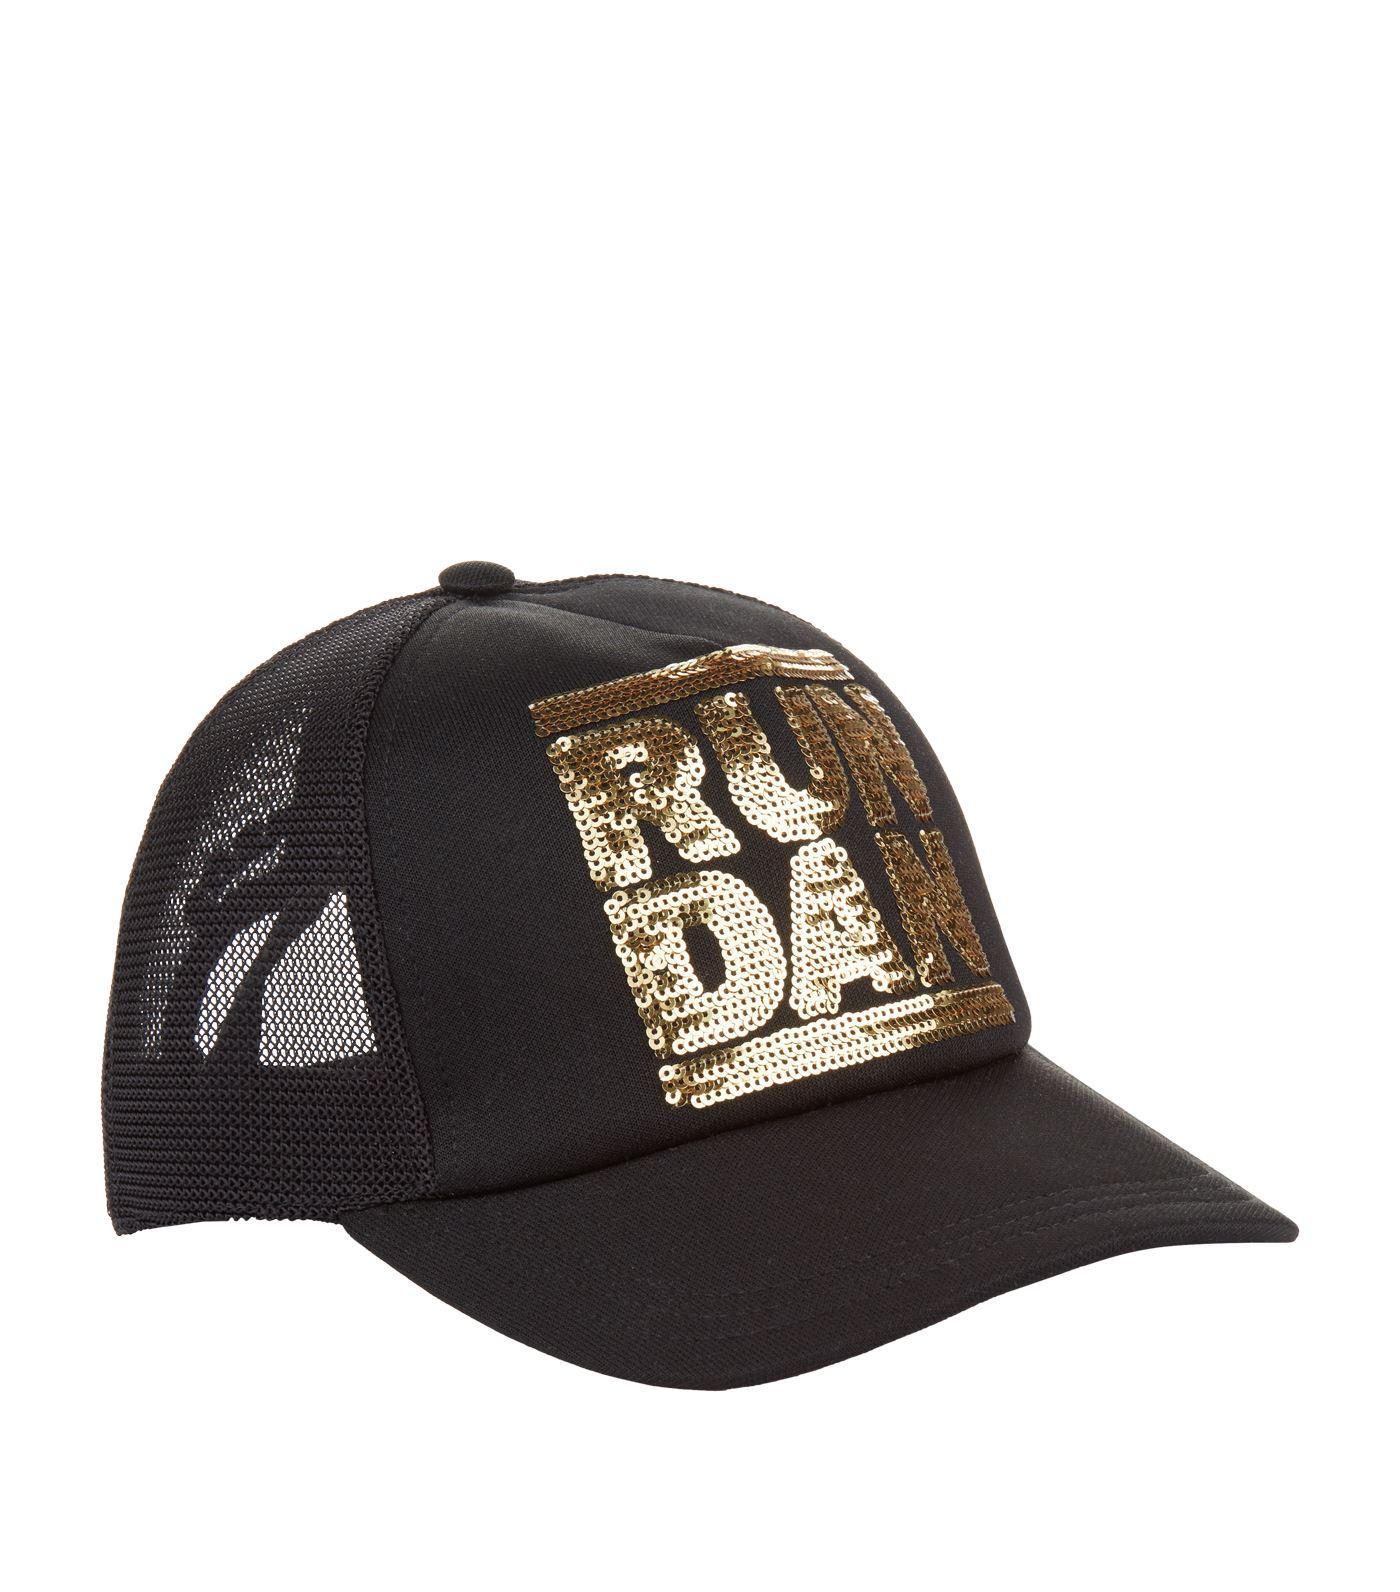 20485854044 DSquared² Run Dan Sequin Cap in Black for Men - Lyst